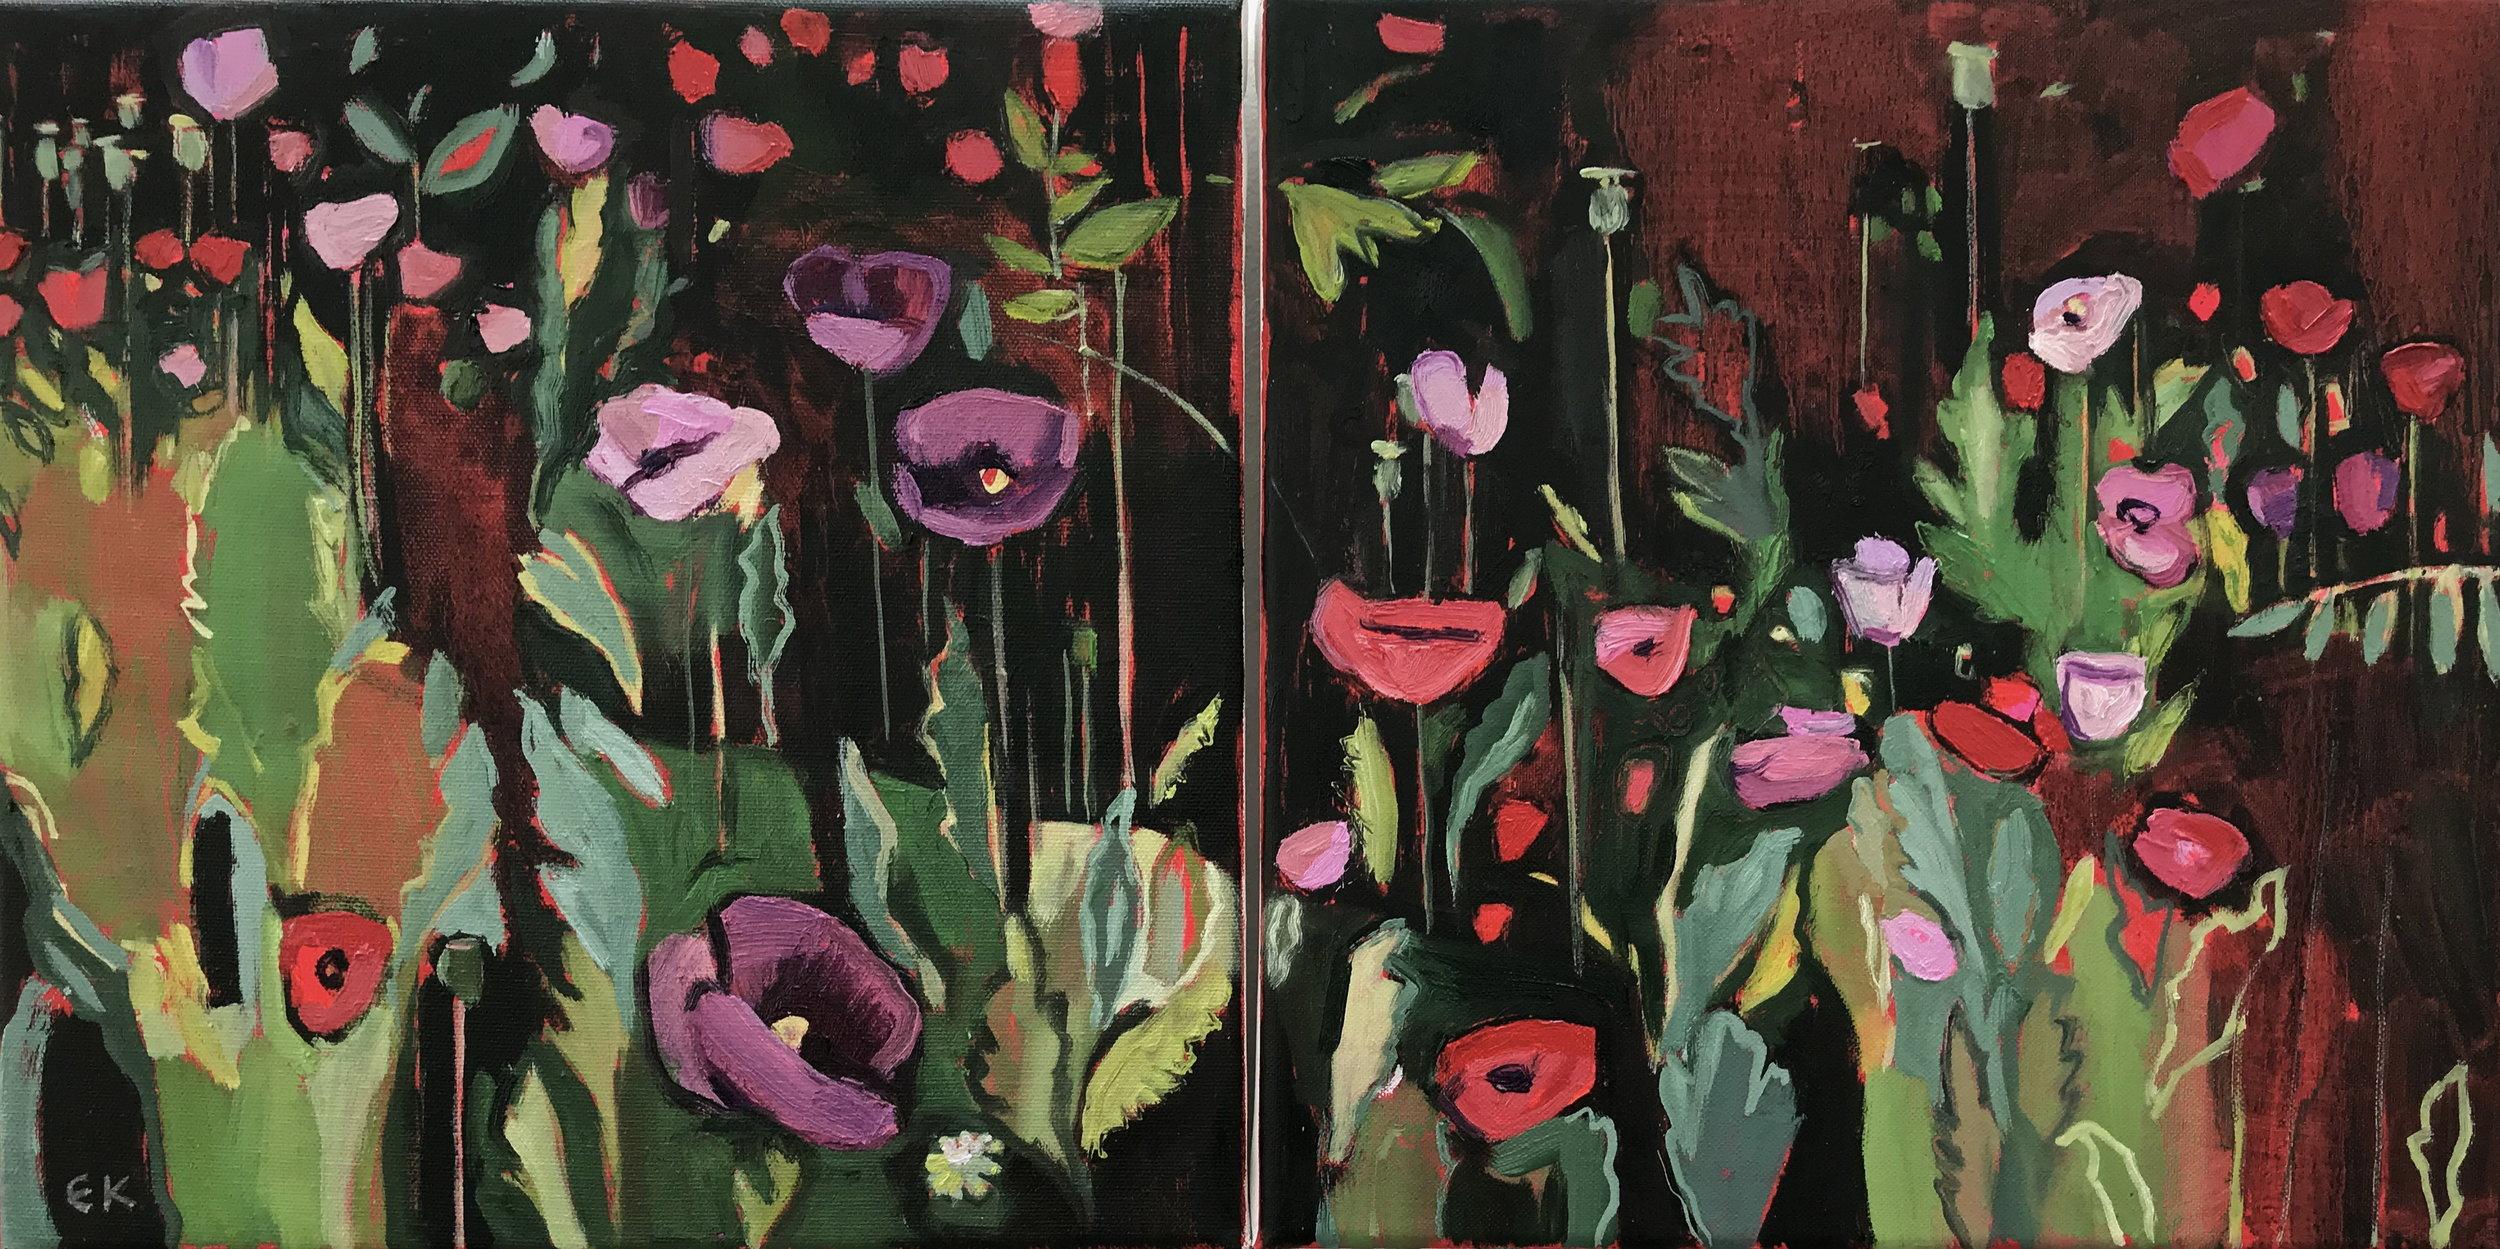 Diptych: Opium Poppies in the Oxford Botanic Gardens